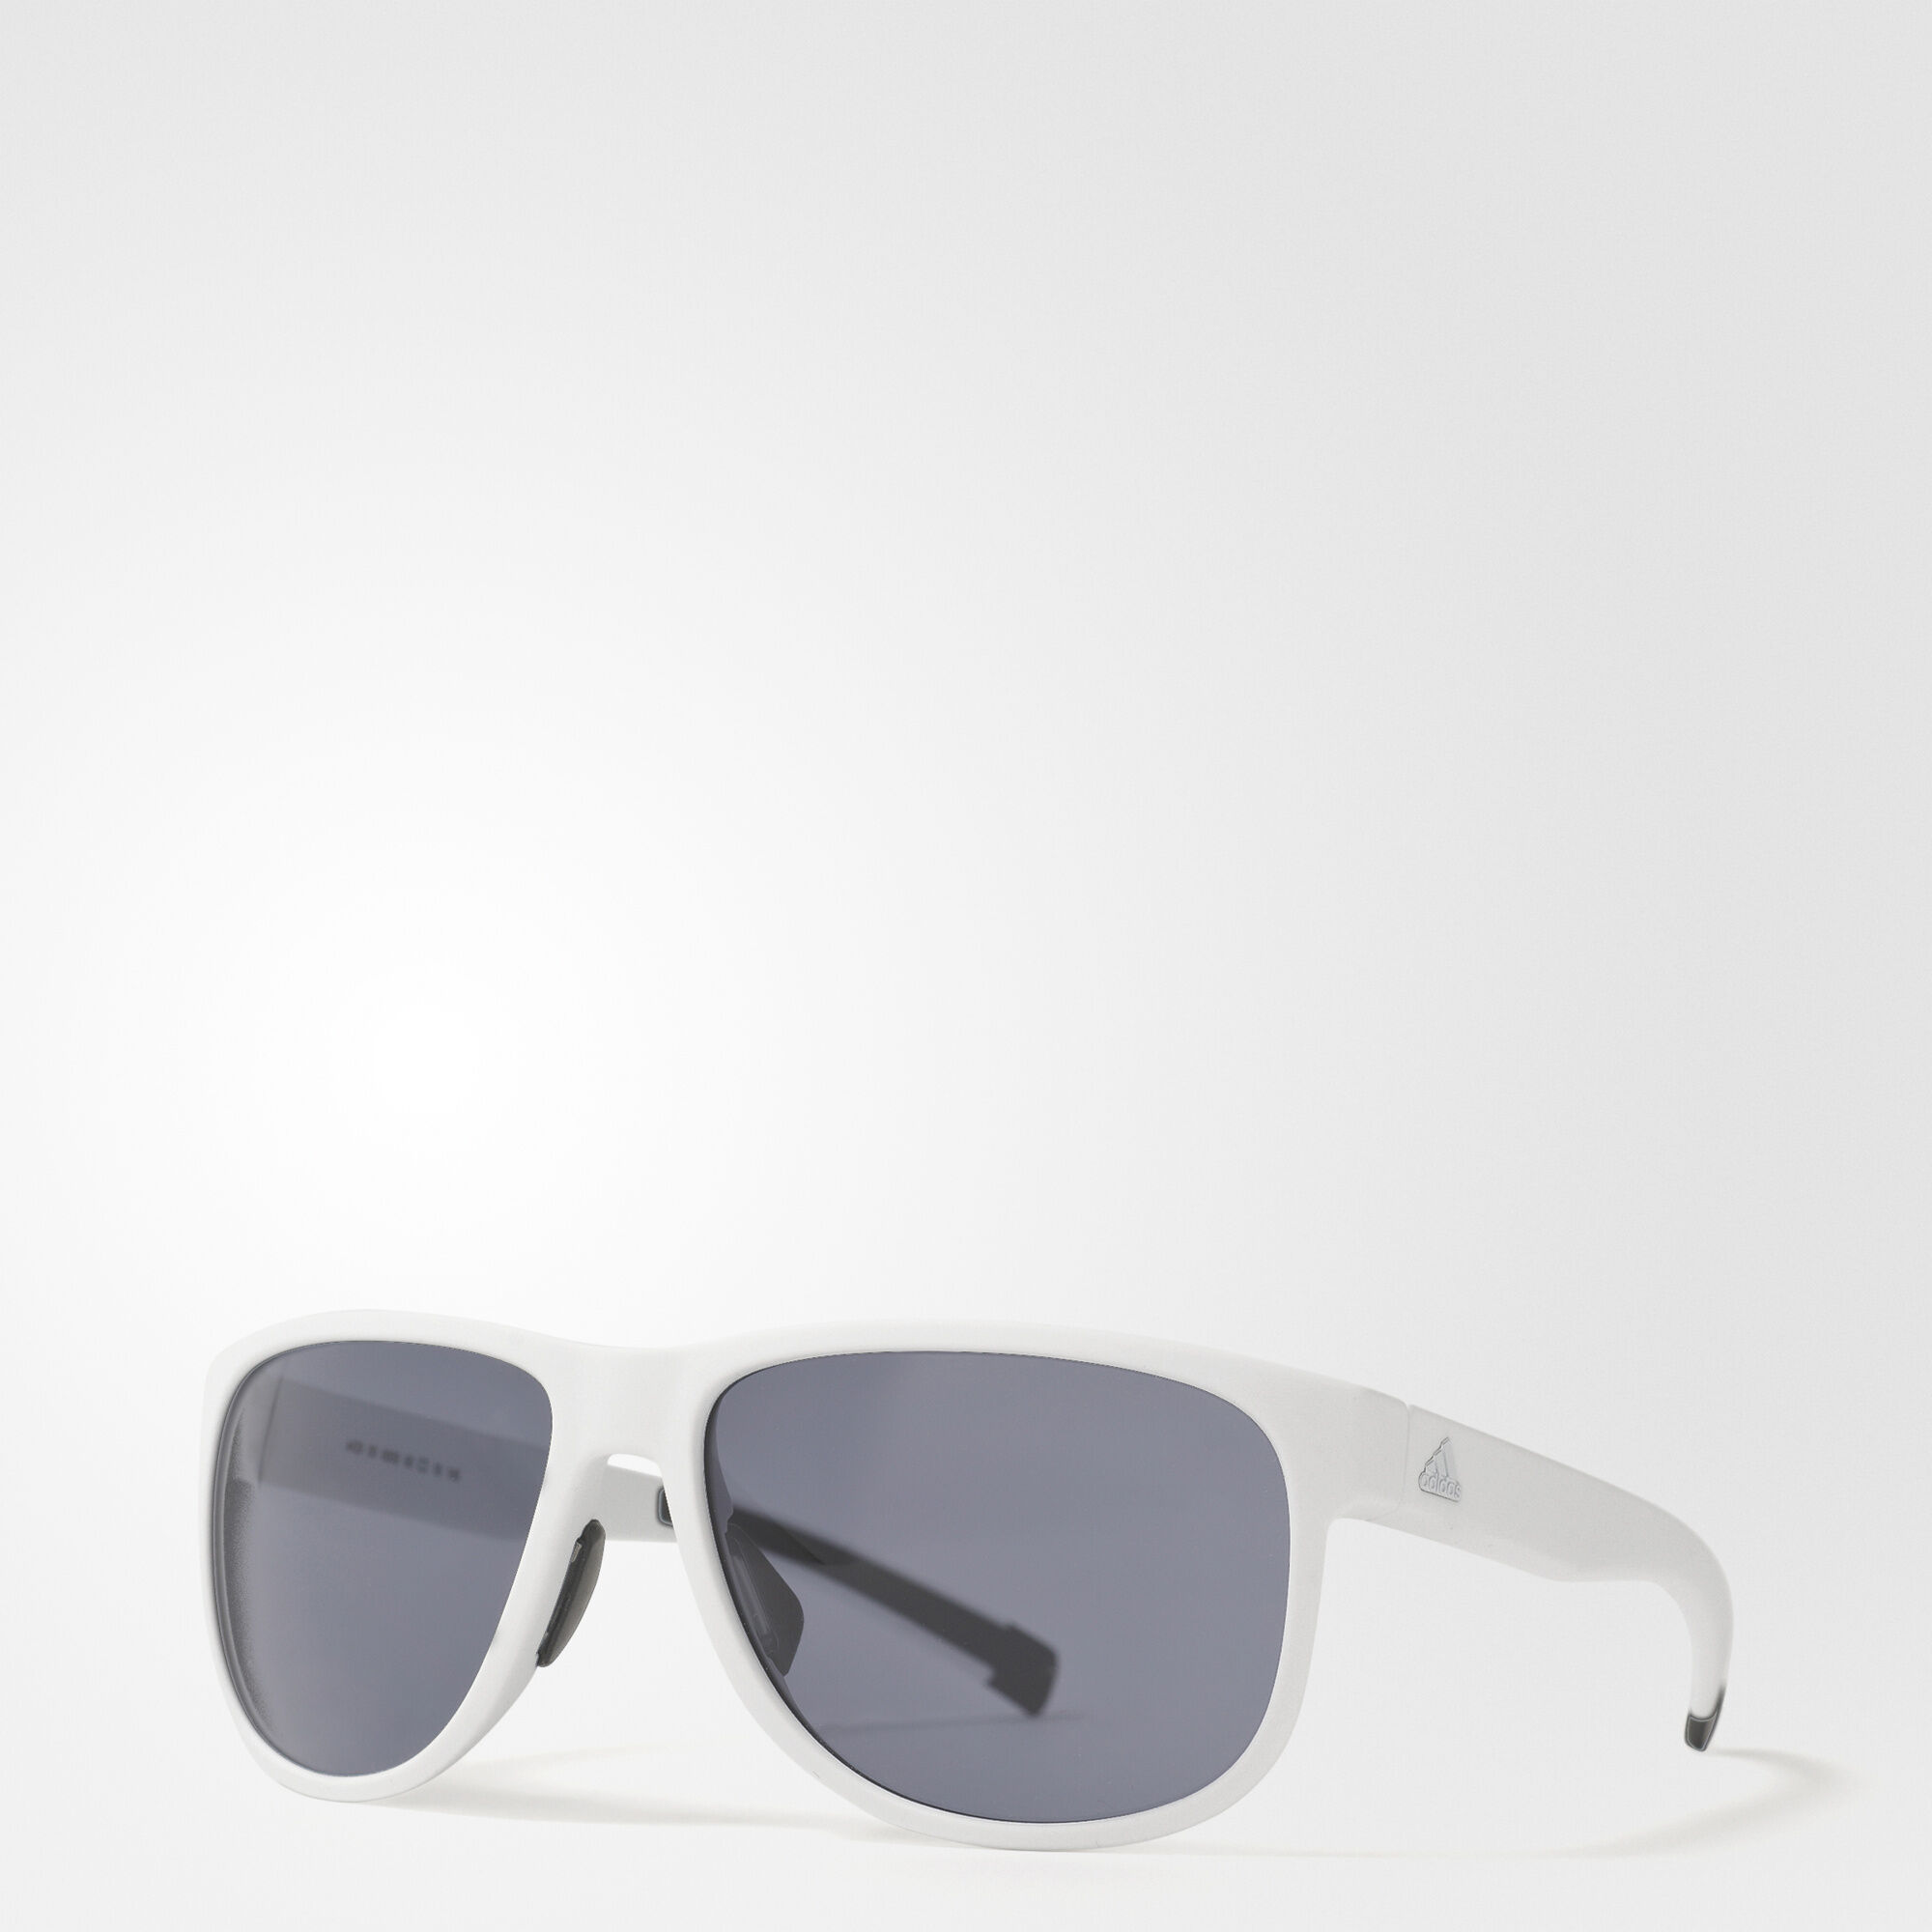 adidas supernova sunglasses